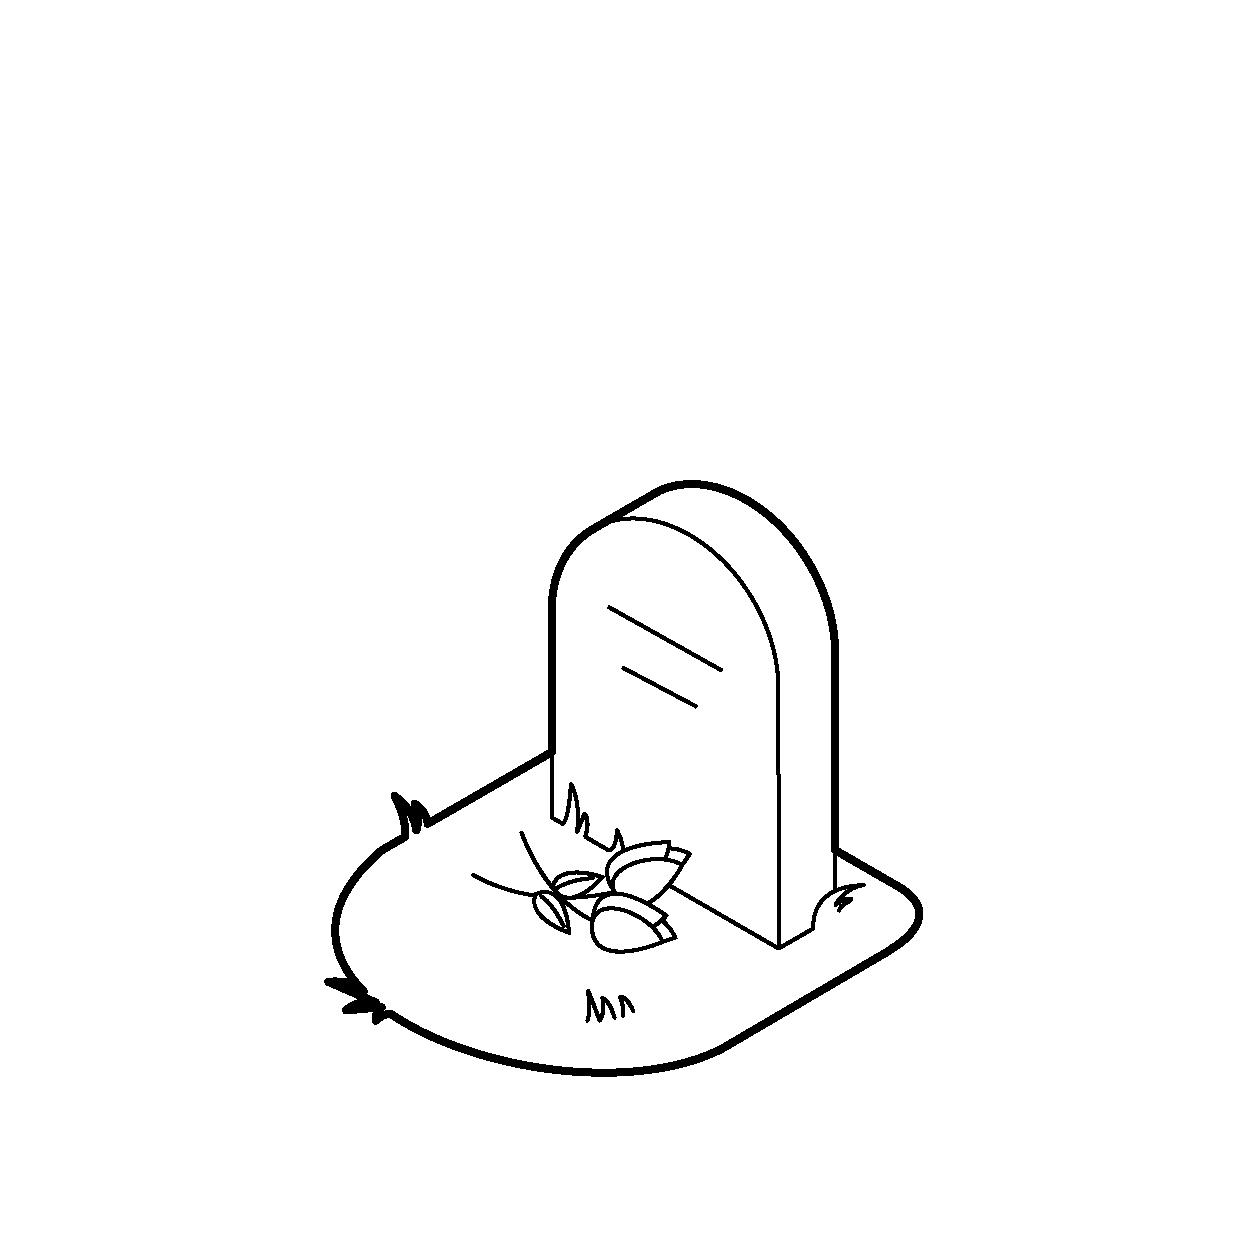 death-01.png